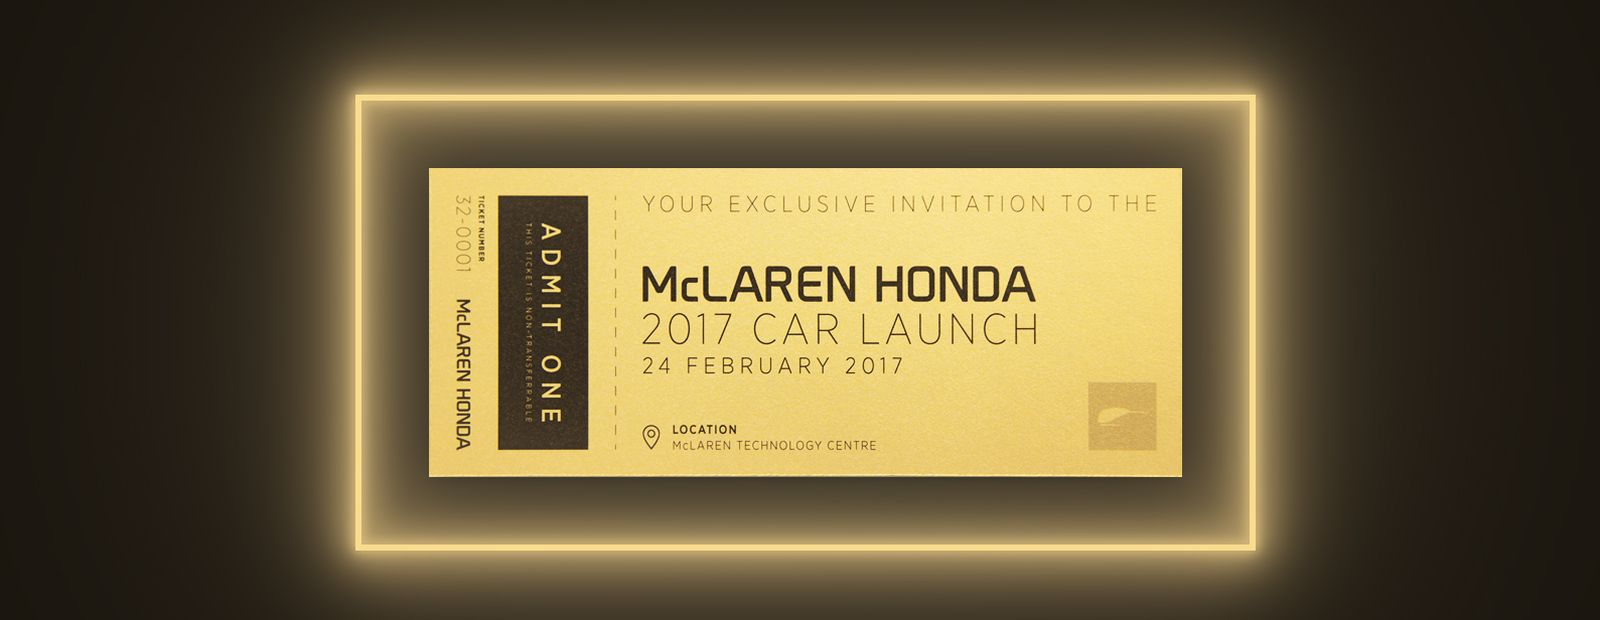 Fastest Car In The World 2015 >> McLaren Formula 1 - Will you be the next McLaren Golden Ticket winner?